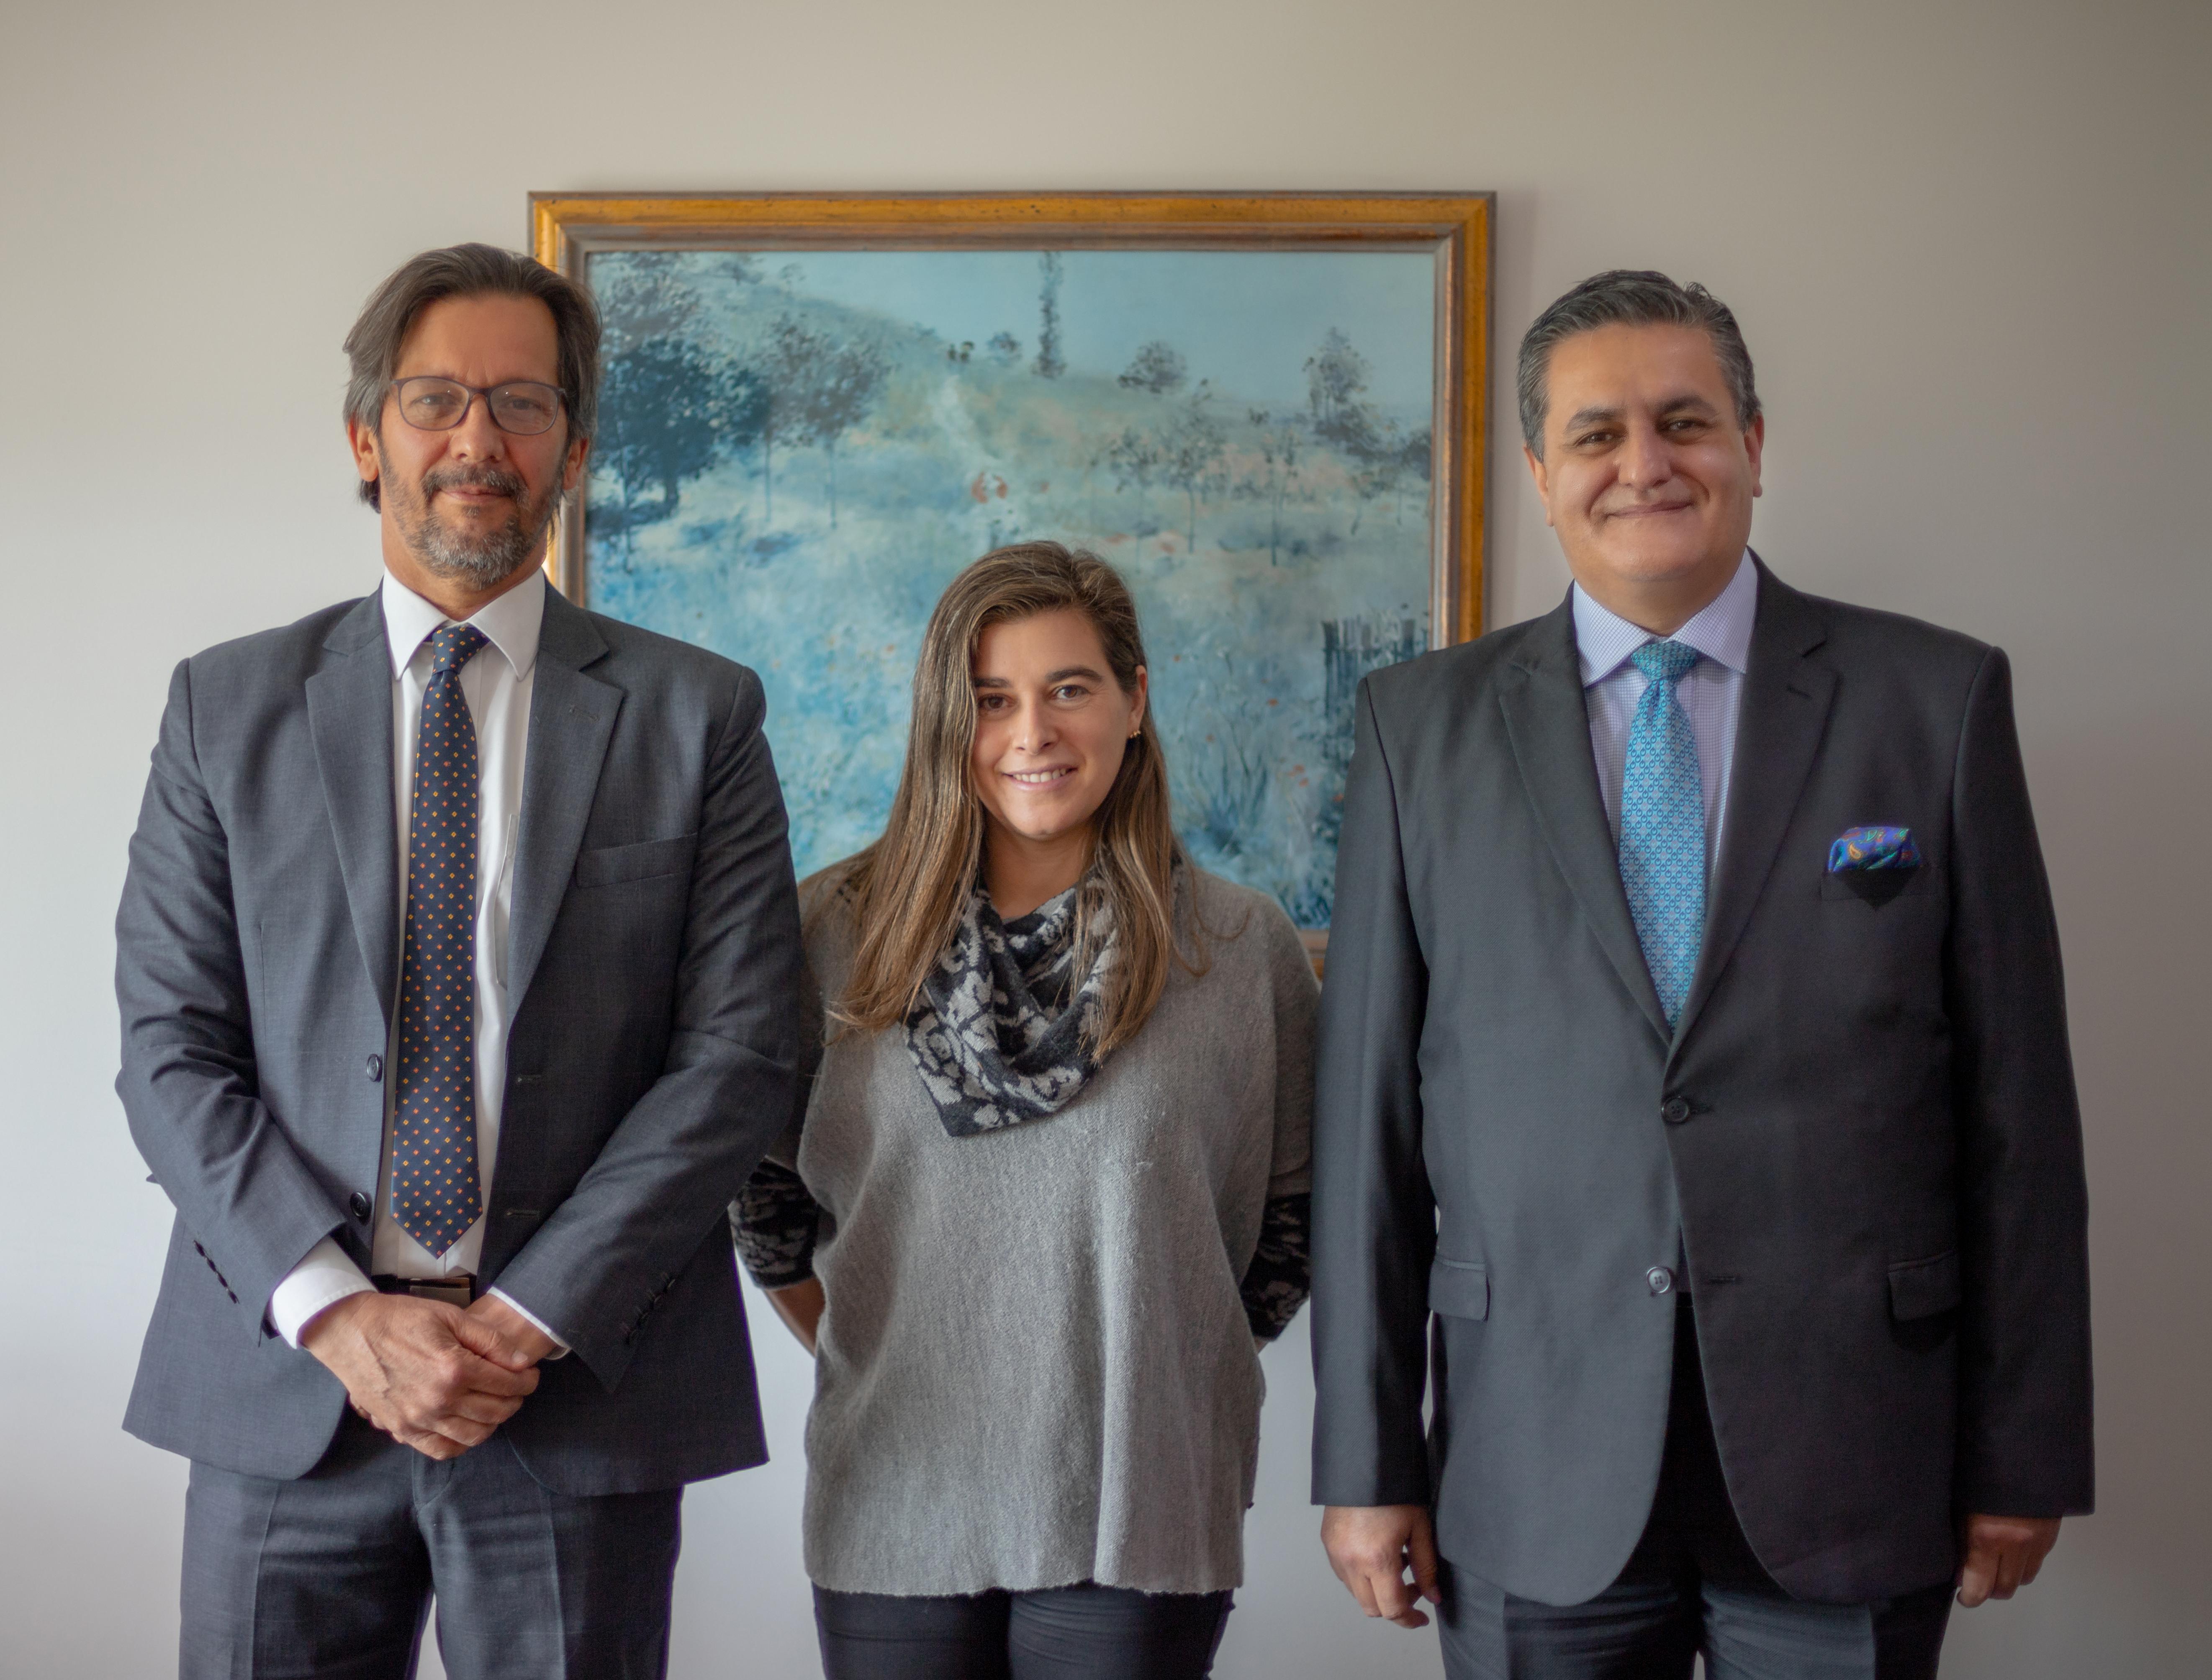 De izquierda a derecha: Dr. Alberto carvajalino Slaghekke, Dra. Adriana Arango Rueda, Dr. Herhán Olano Garcia.